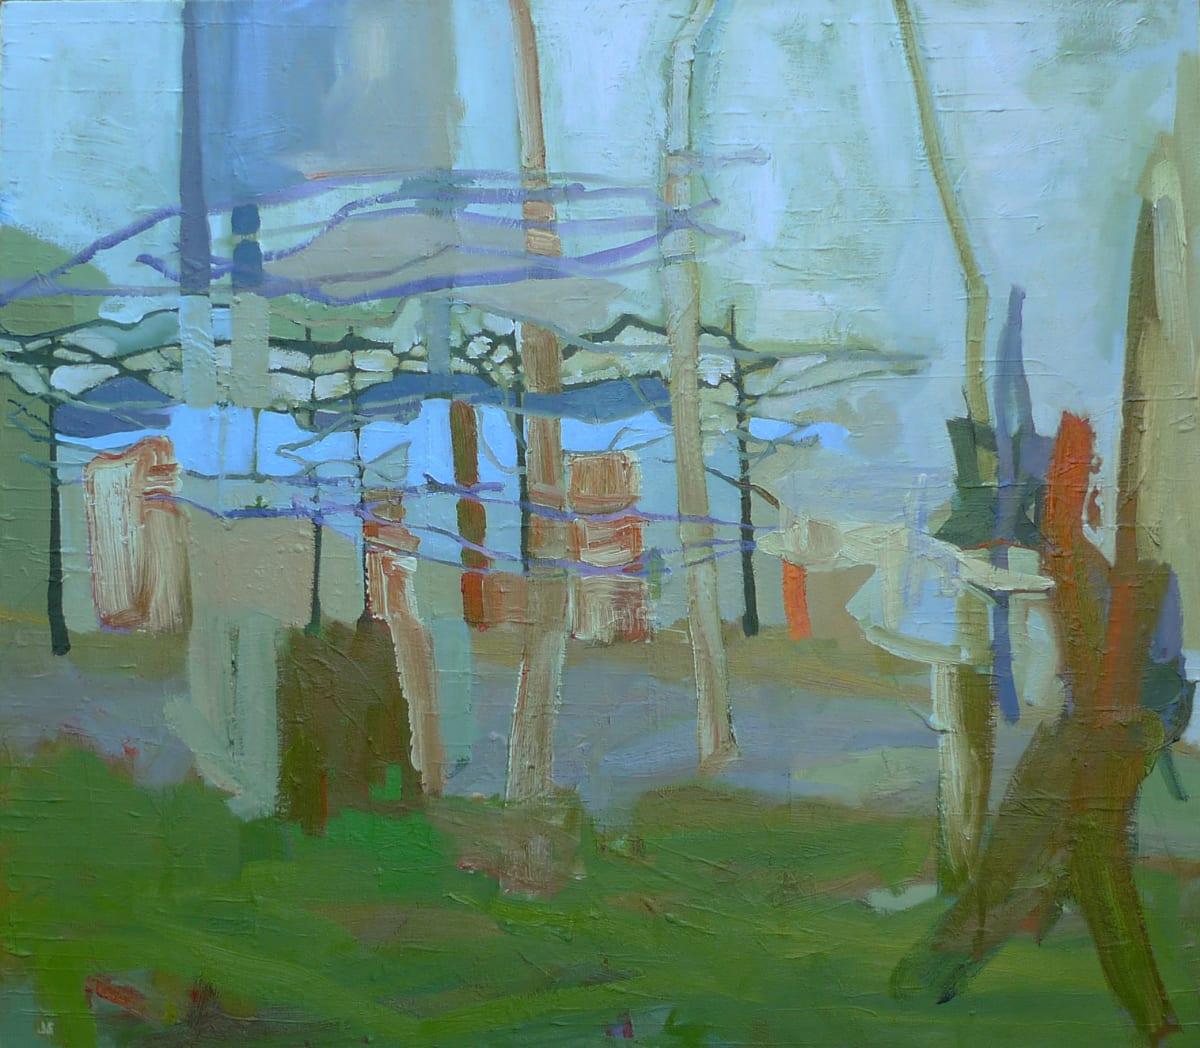 Leaving River Run by Jessica Singerman